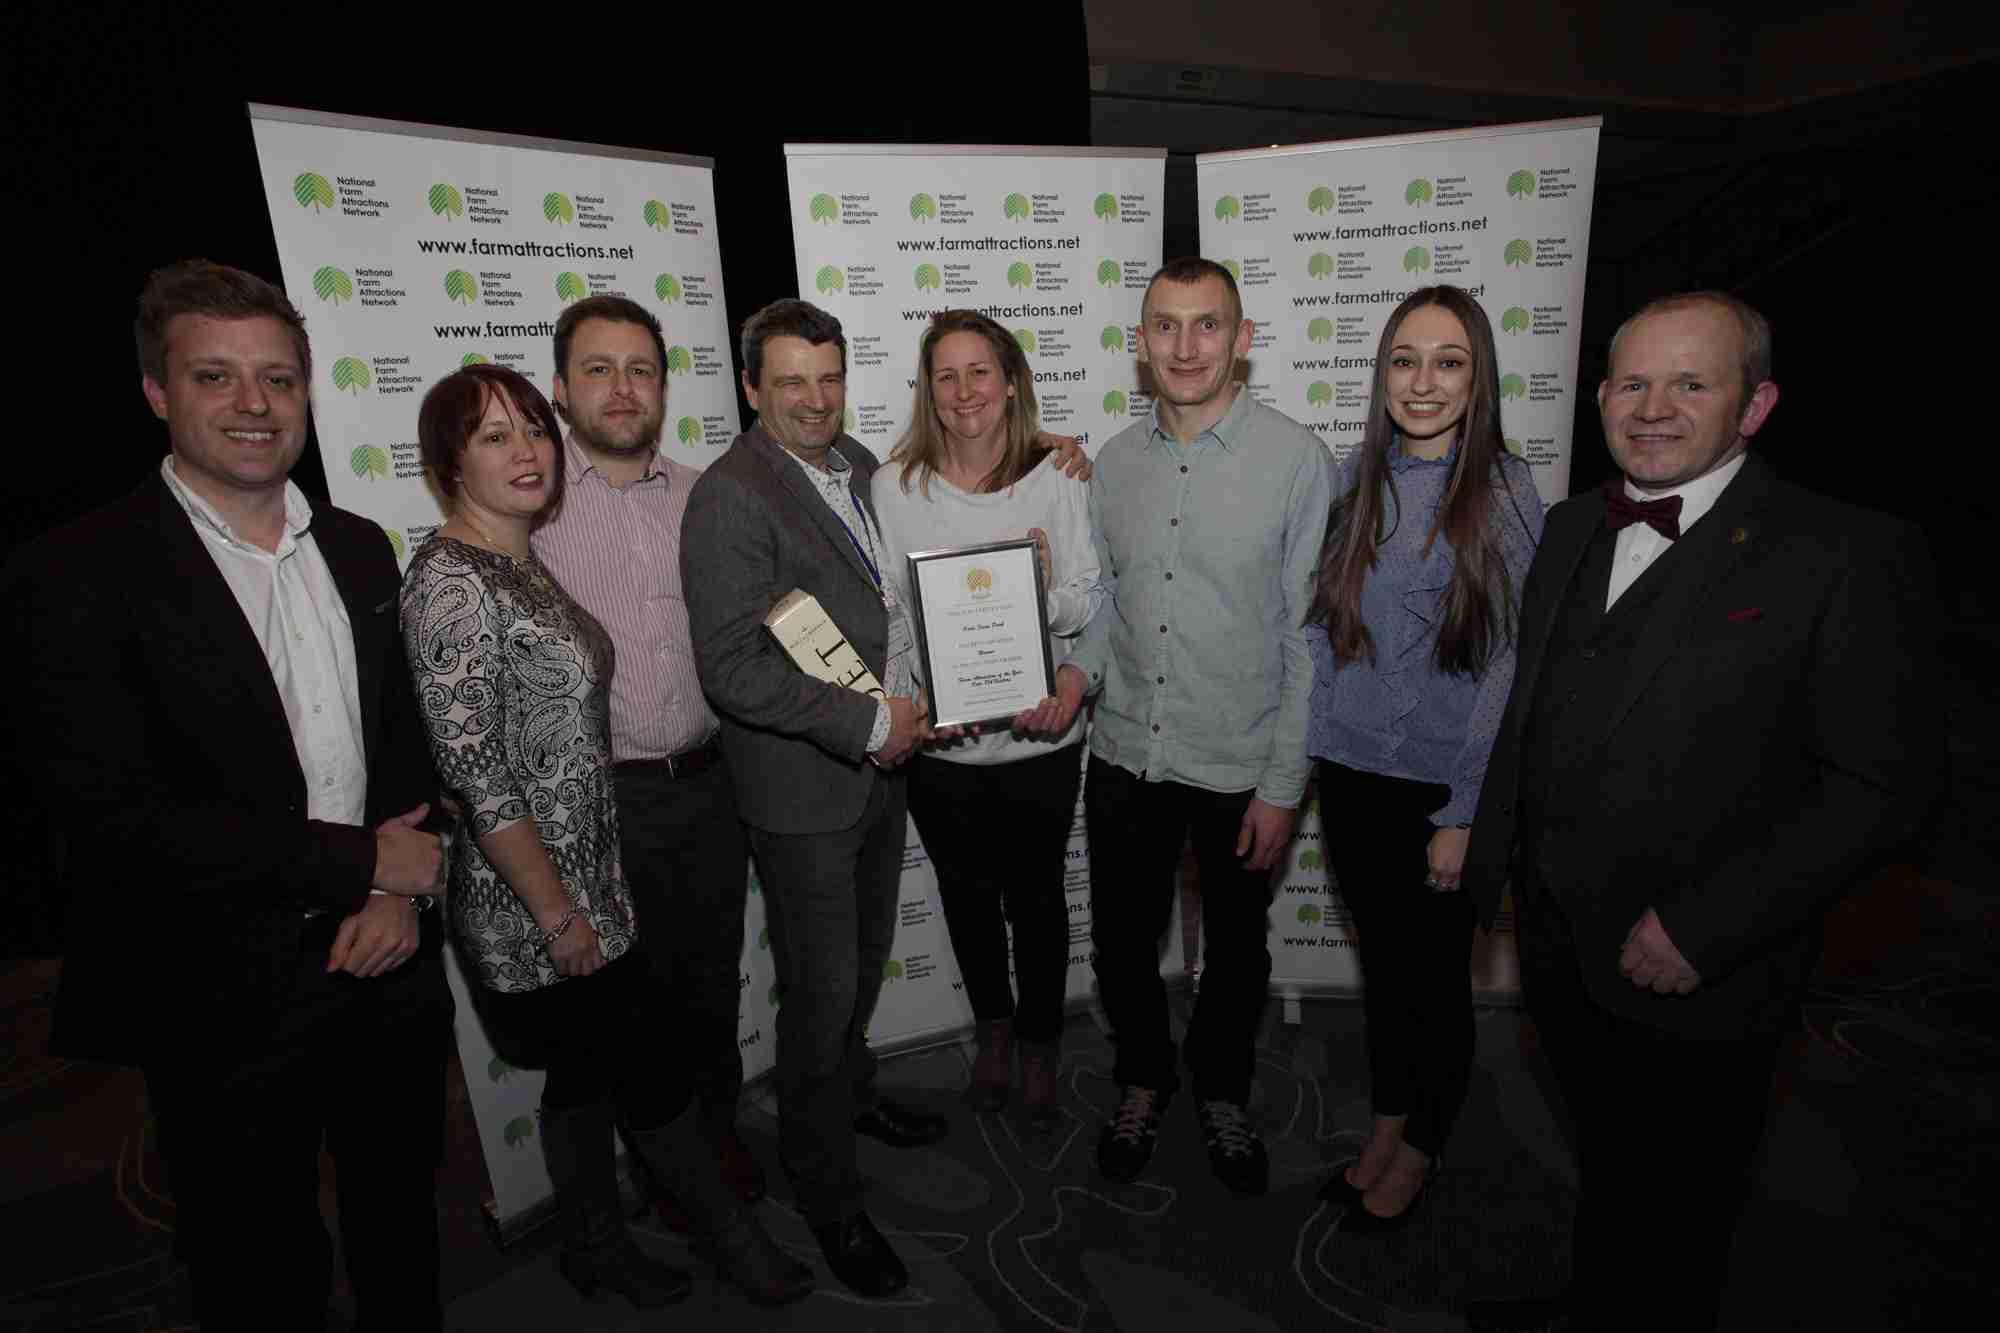 NFAN Awards: Farm Attraction Winners Announced